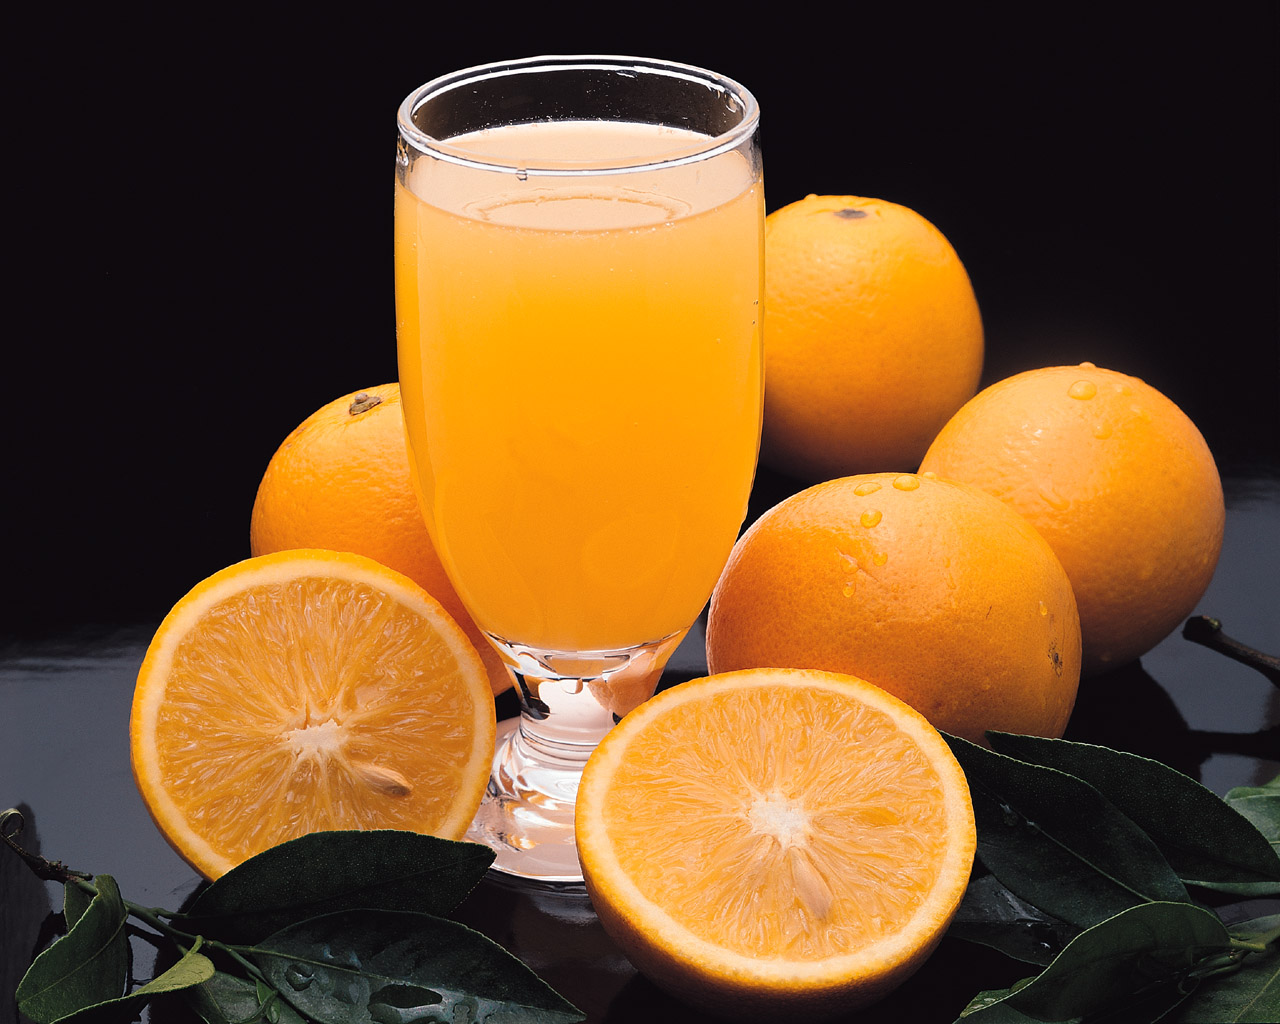 Nutritional Information Of Orange Juice